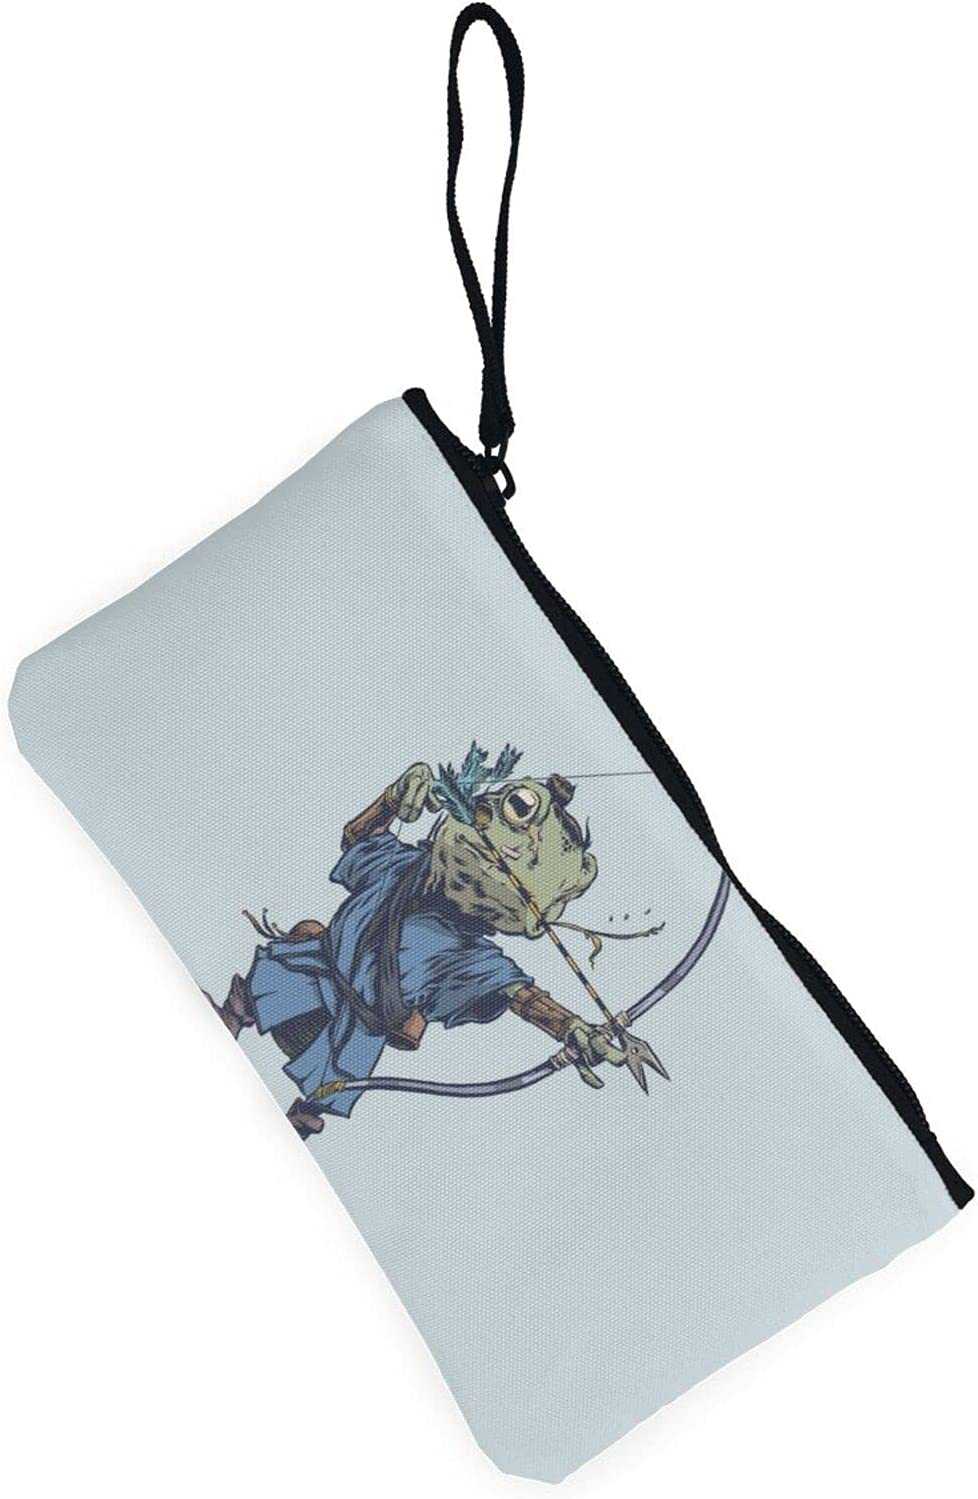 AORRUAM Samurai Frog archery Canvas Coin Purse,Canvas Zipper Pencil Cases,Canvas Change Purse Pouch Mini Wallet Coin Bag